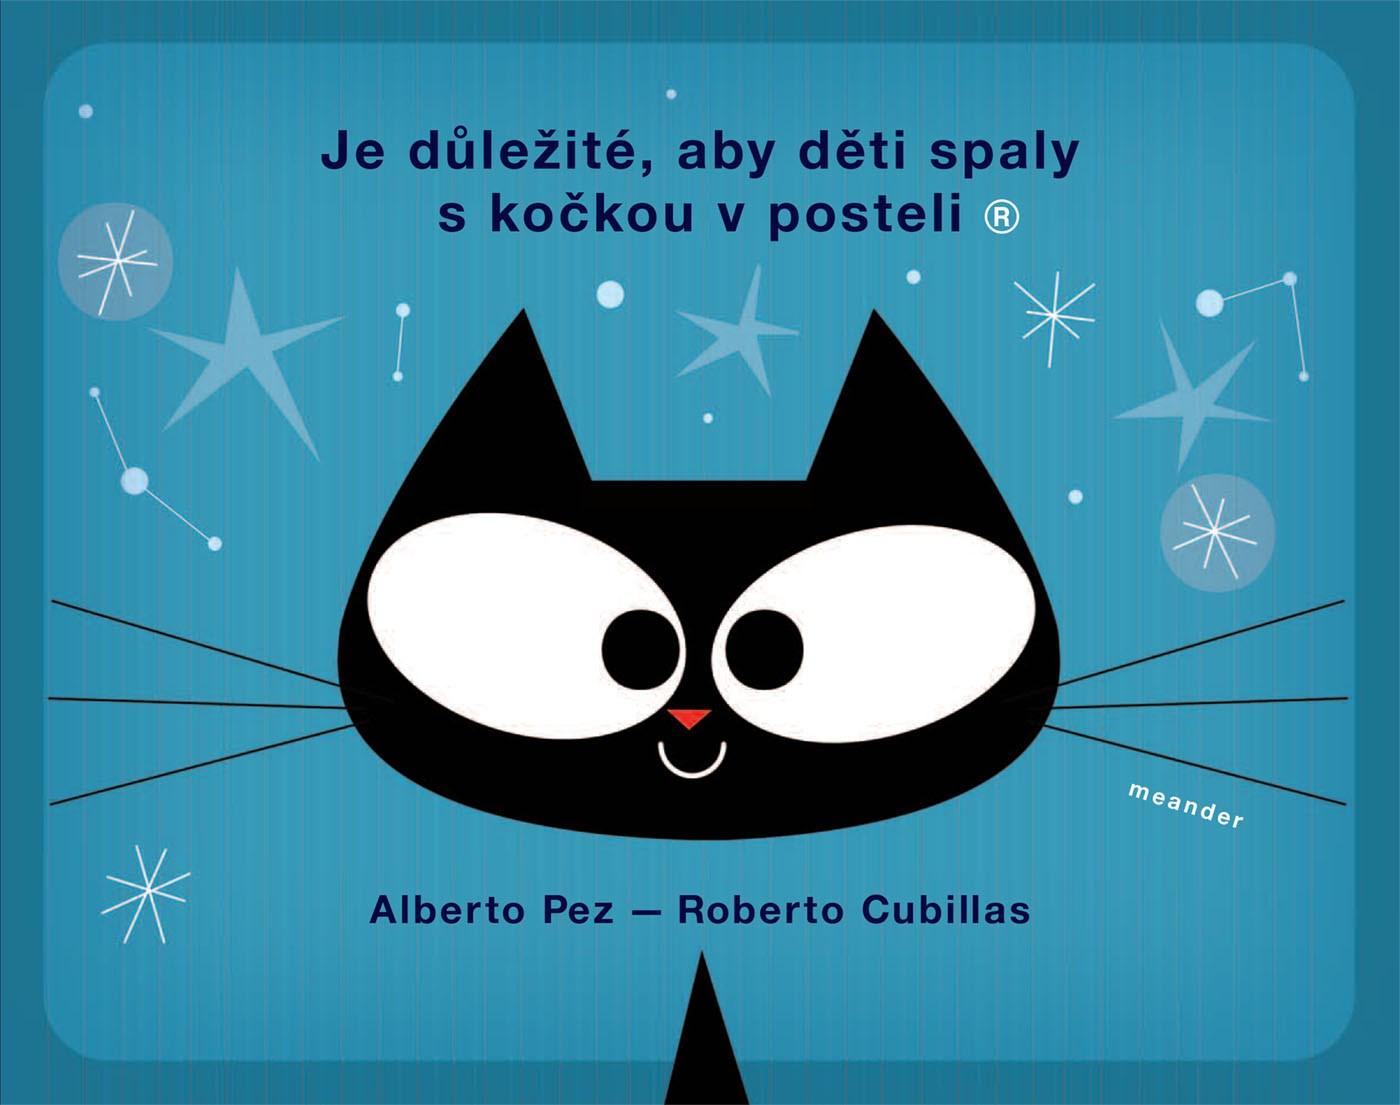 Meander Je důležité, aby děti spaly s kočkou v posteli - Alberto Pez